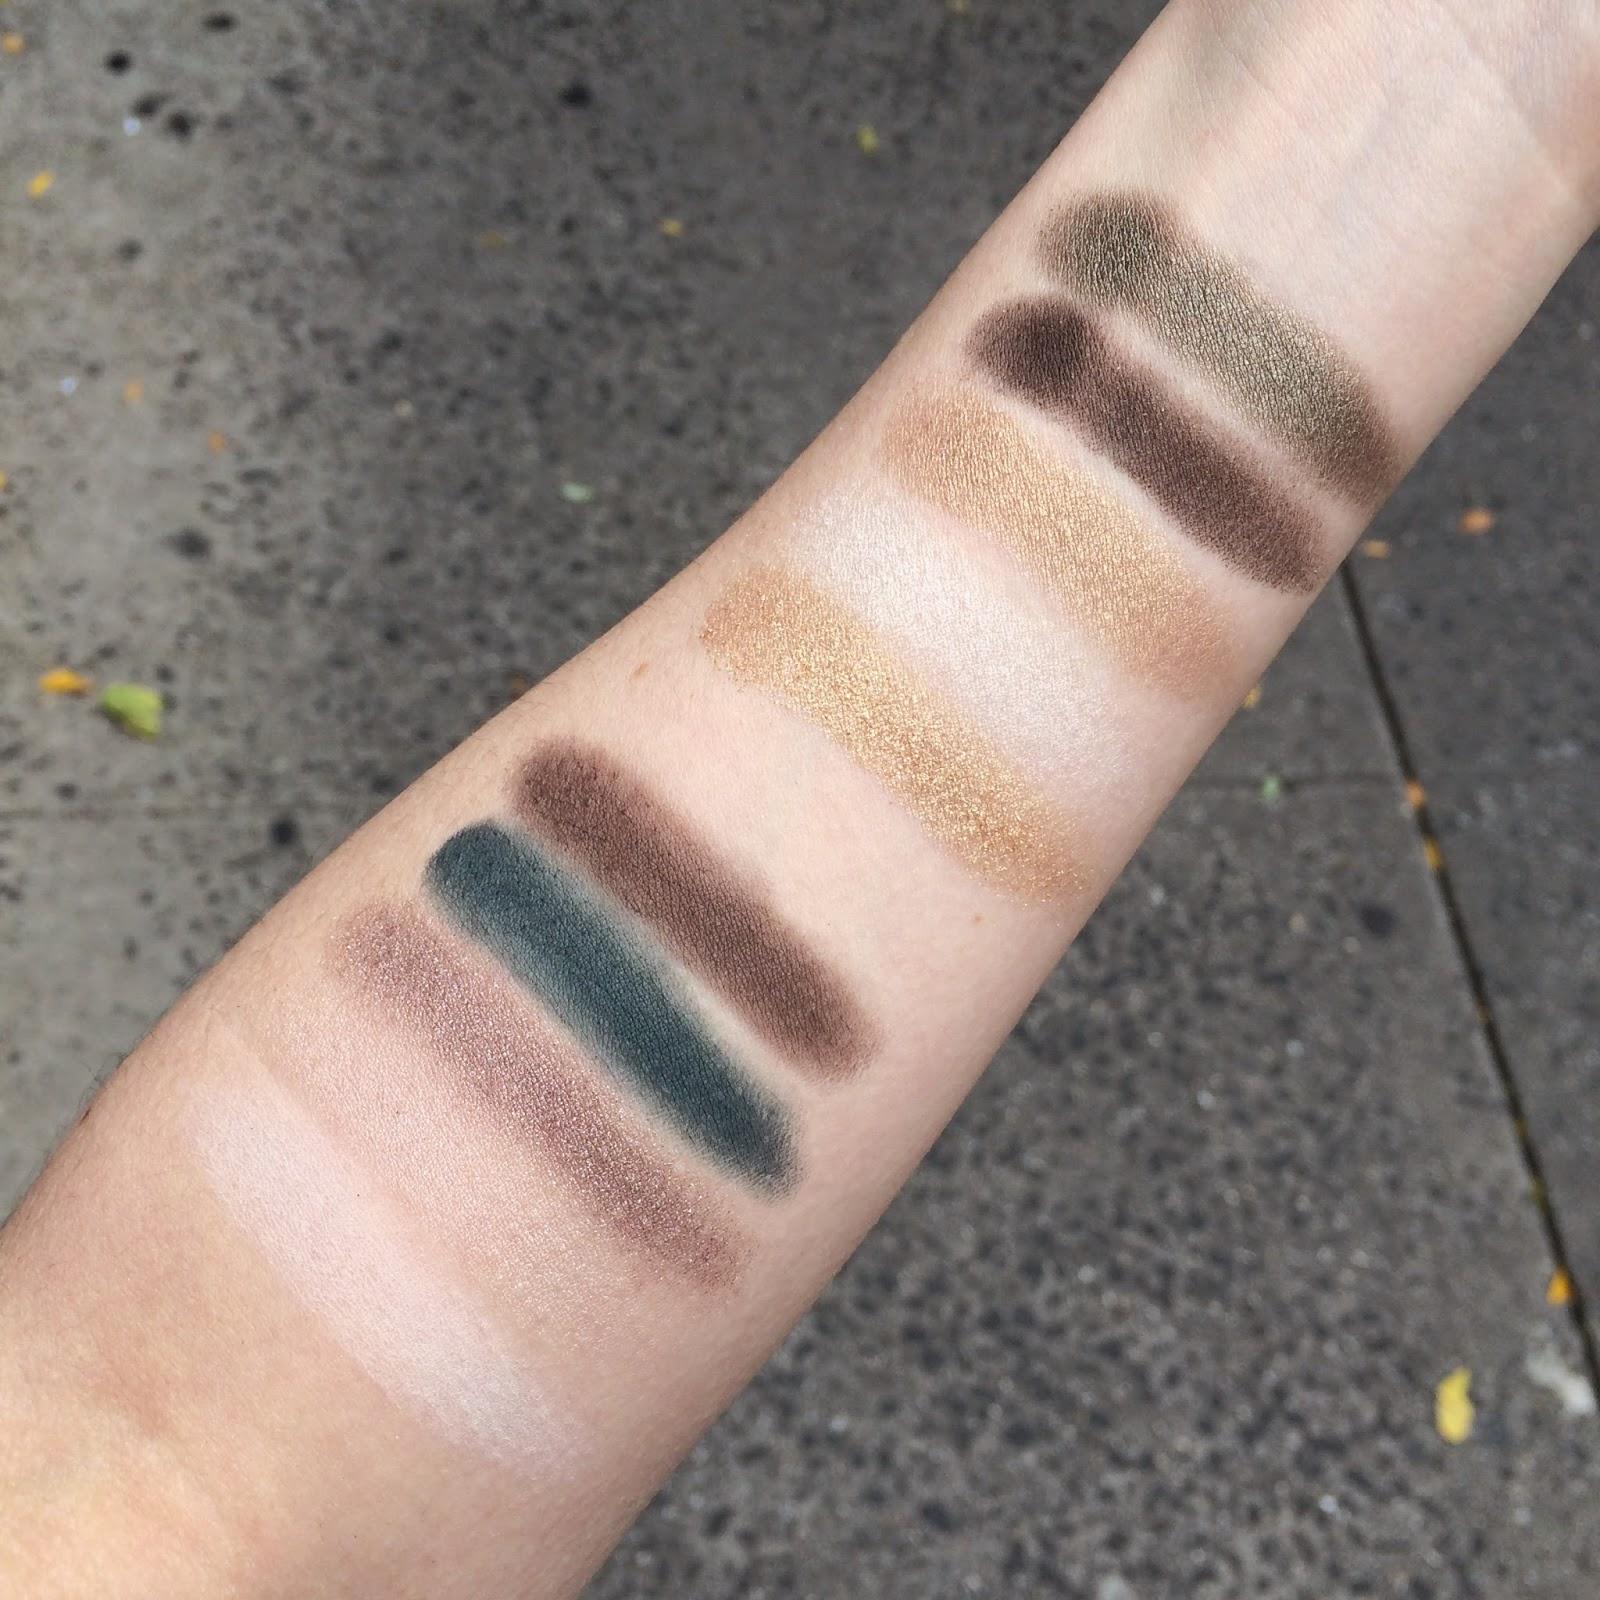 Estee Lauder Pure Color Envy Eye Shadow Palette swatches